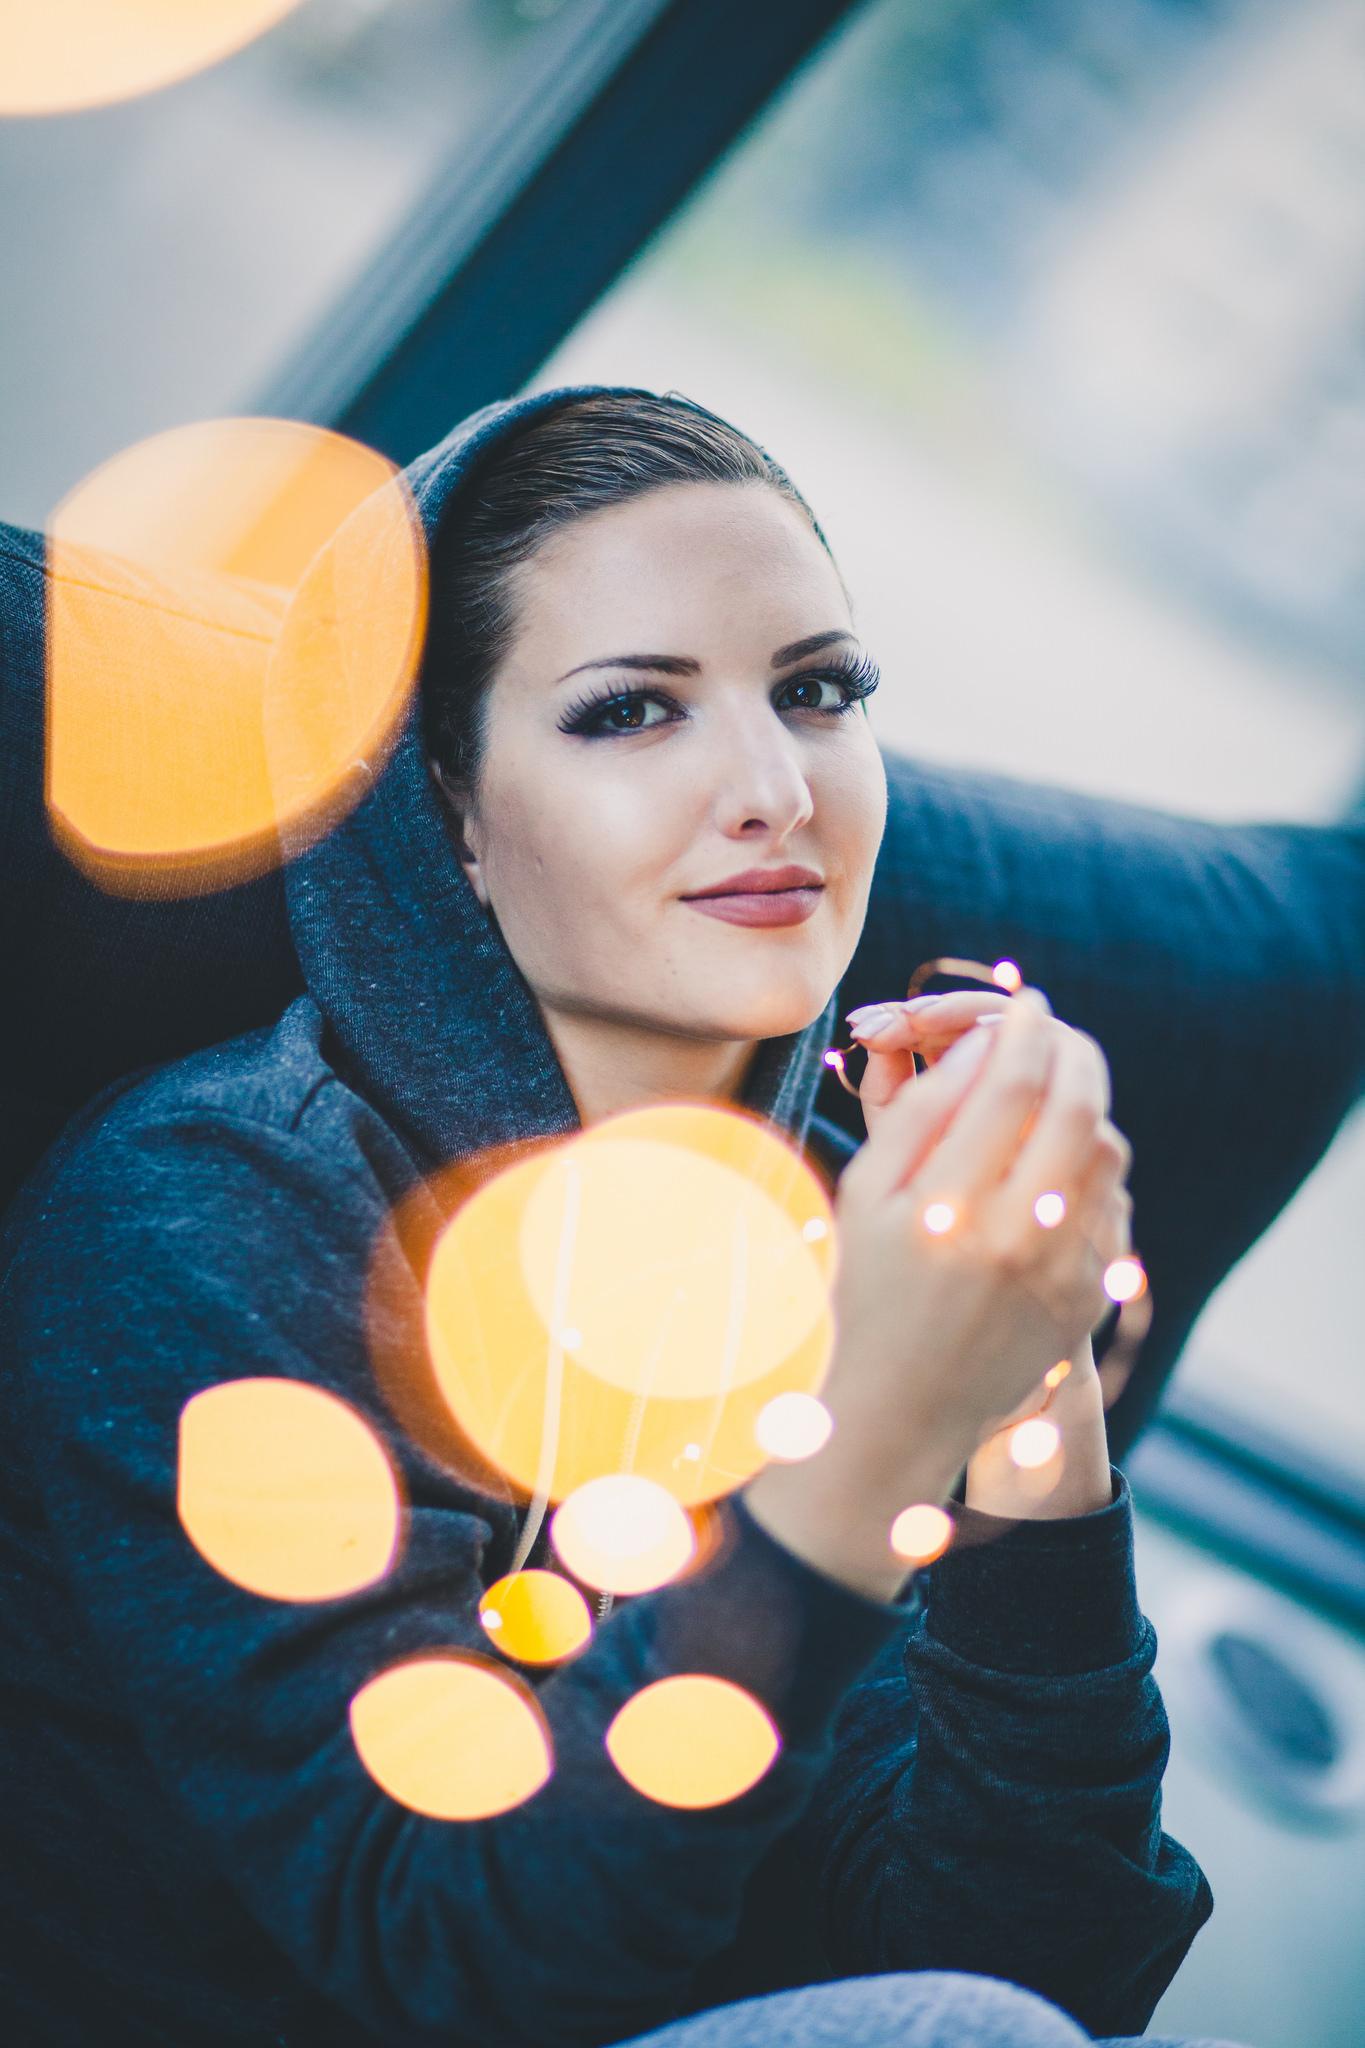 Fairy Lights Portrait Photography